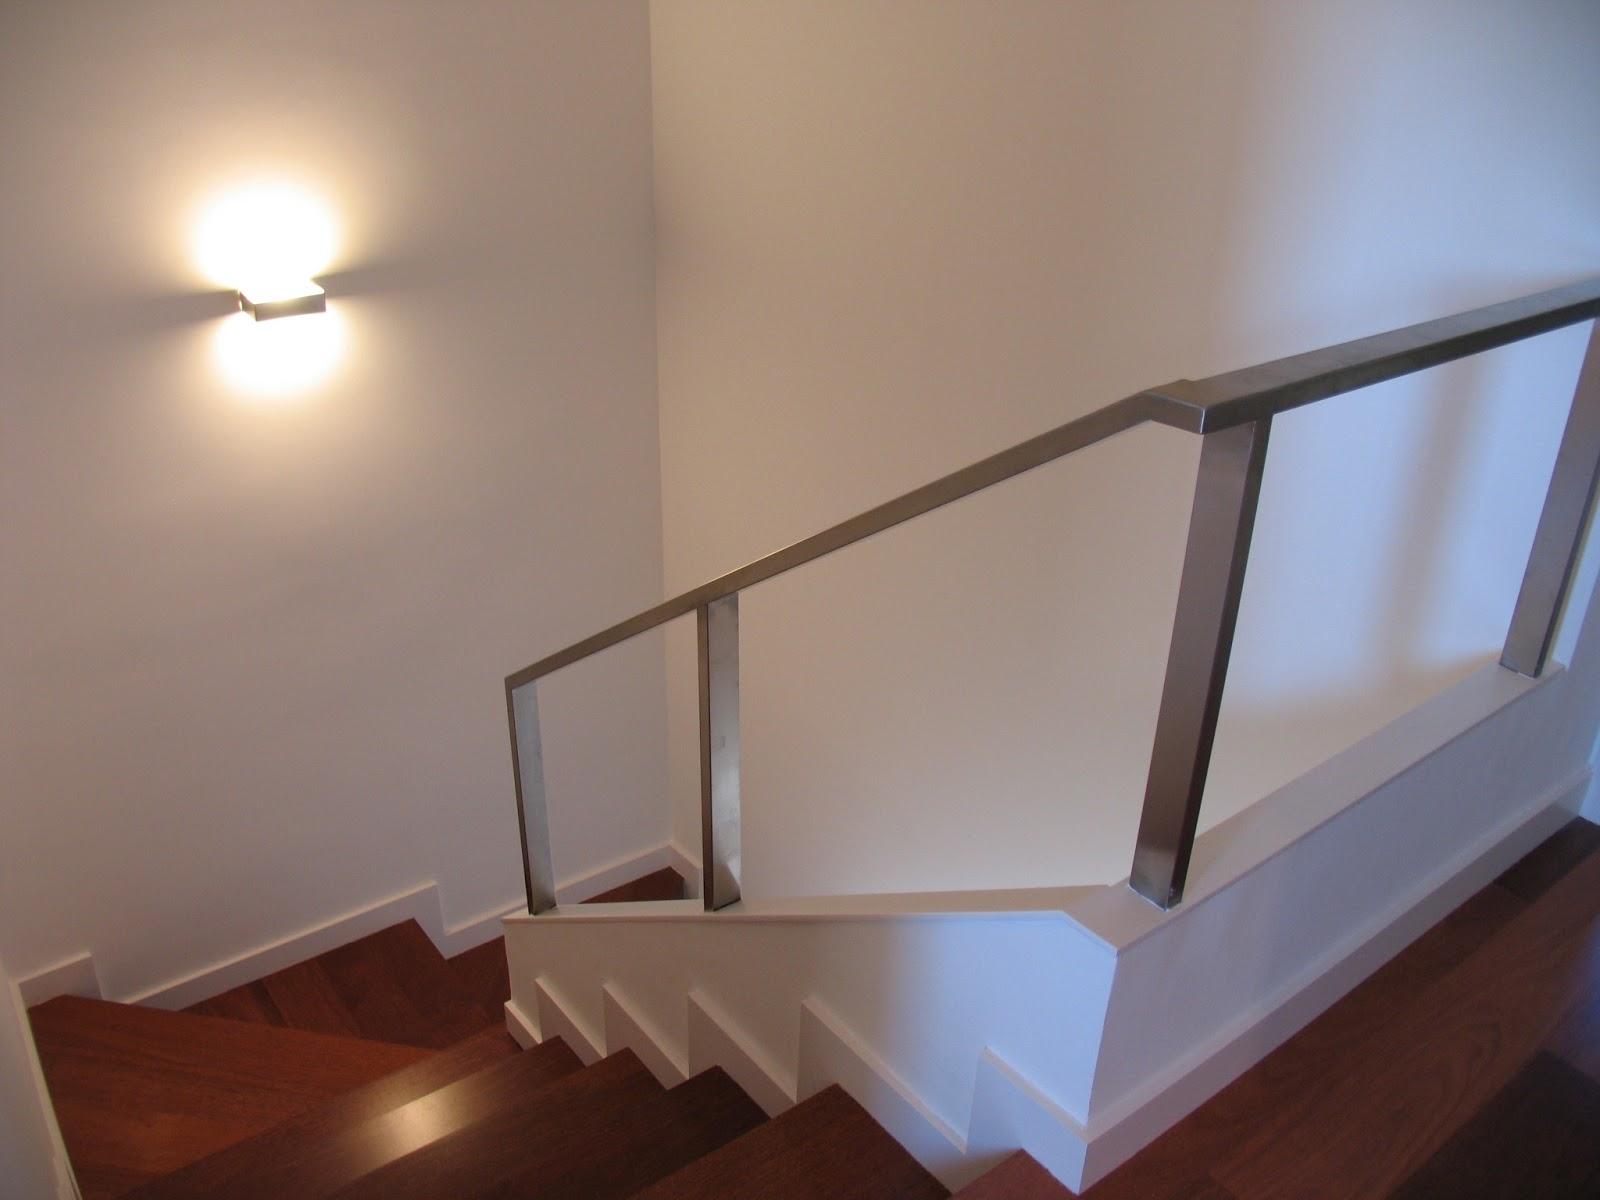 Atrebte pujol iluminaci n a ade a su familia apolo el for Apliques de led para escaleras